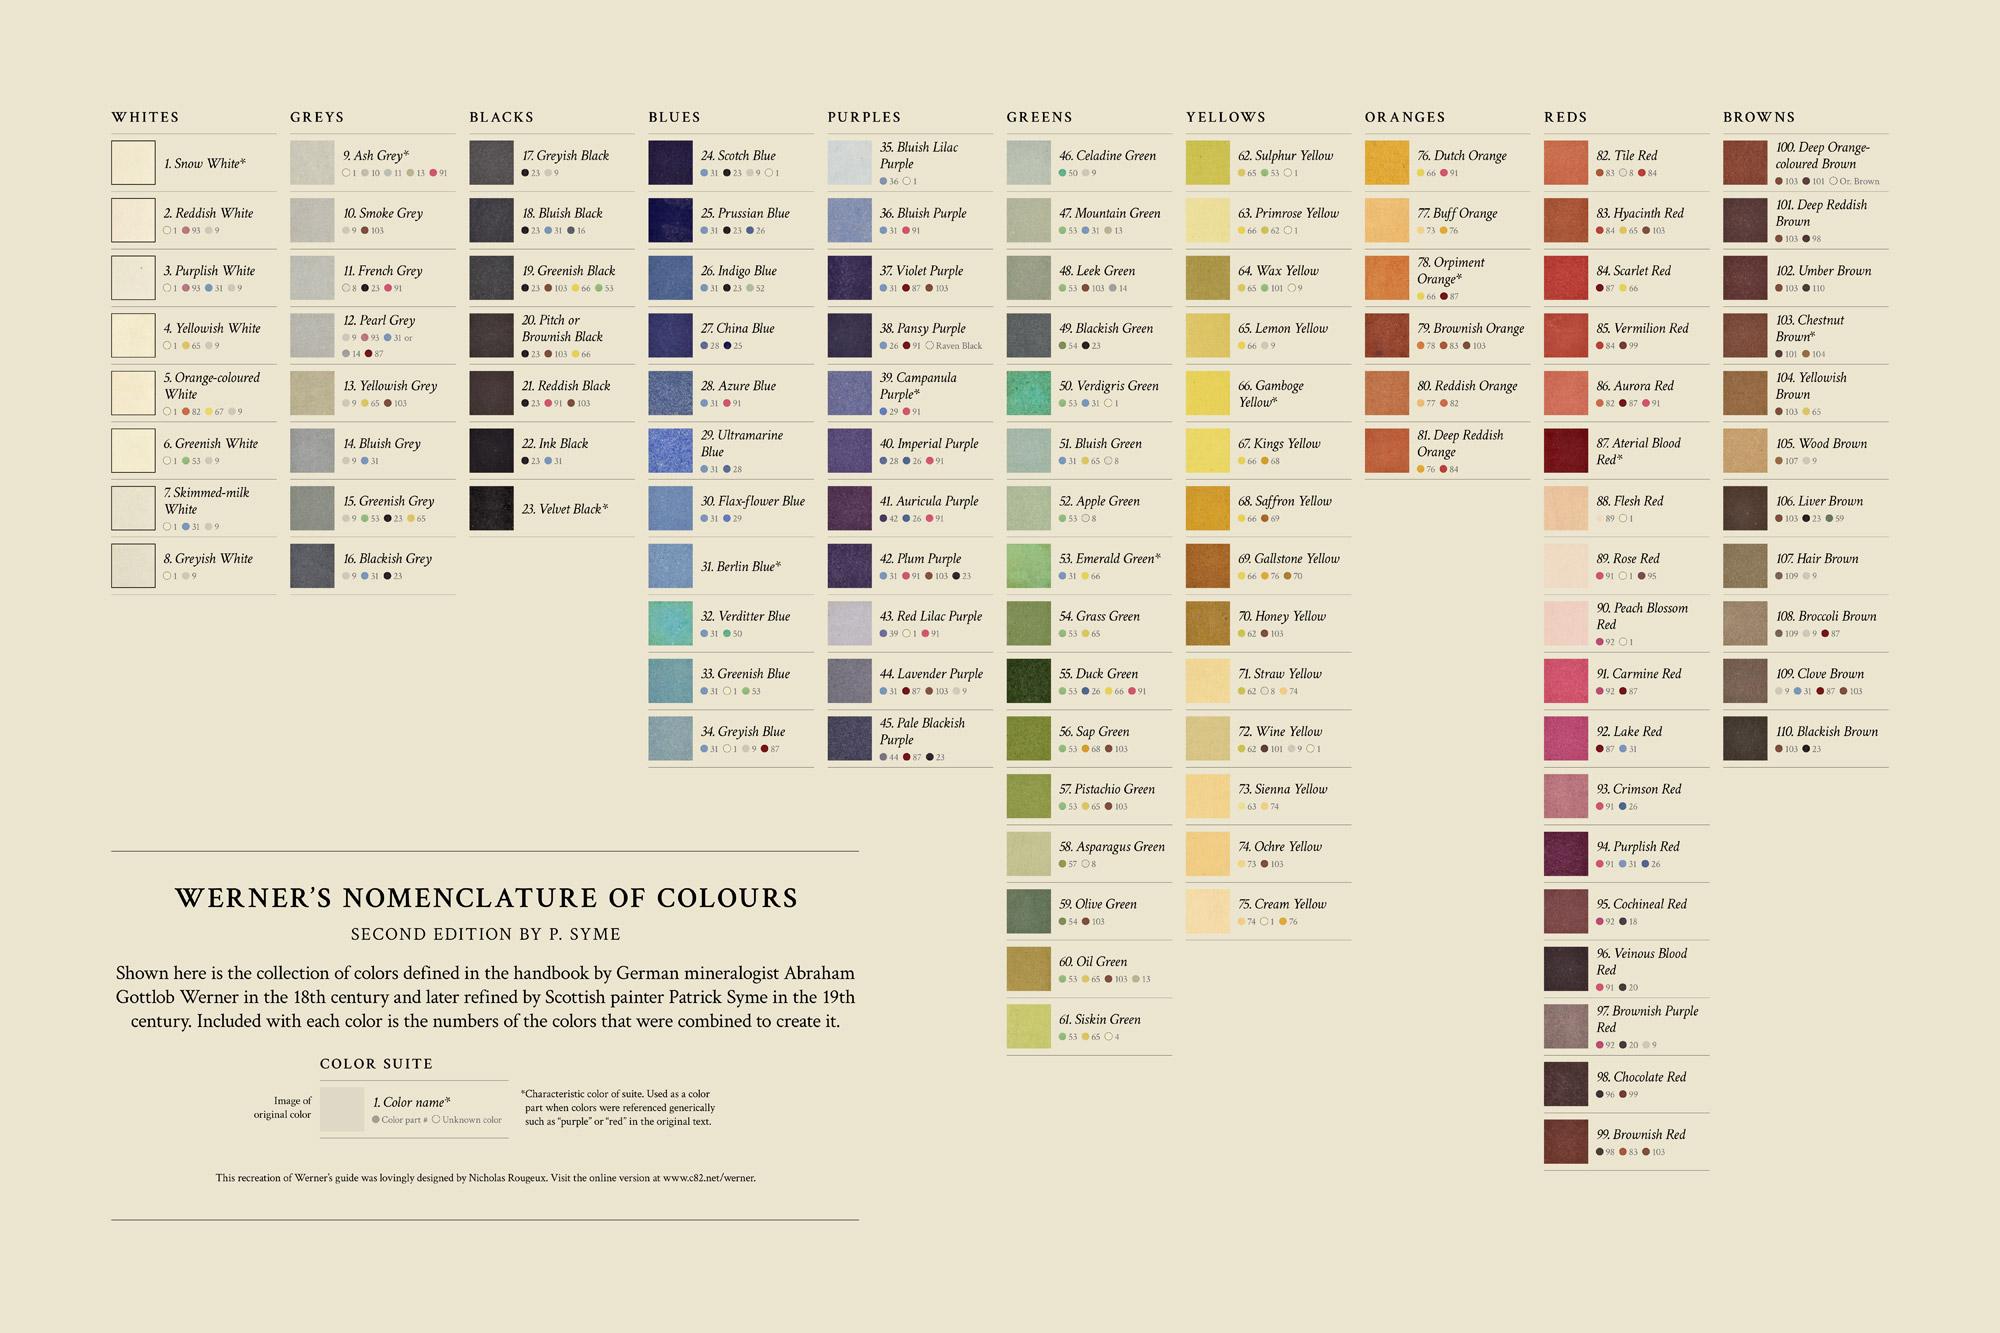 Werner's Nomenclature of Colours Spectrum